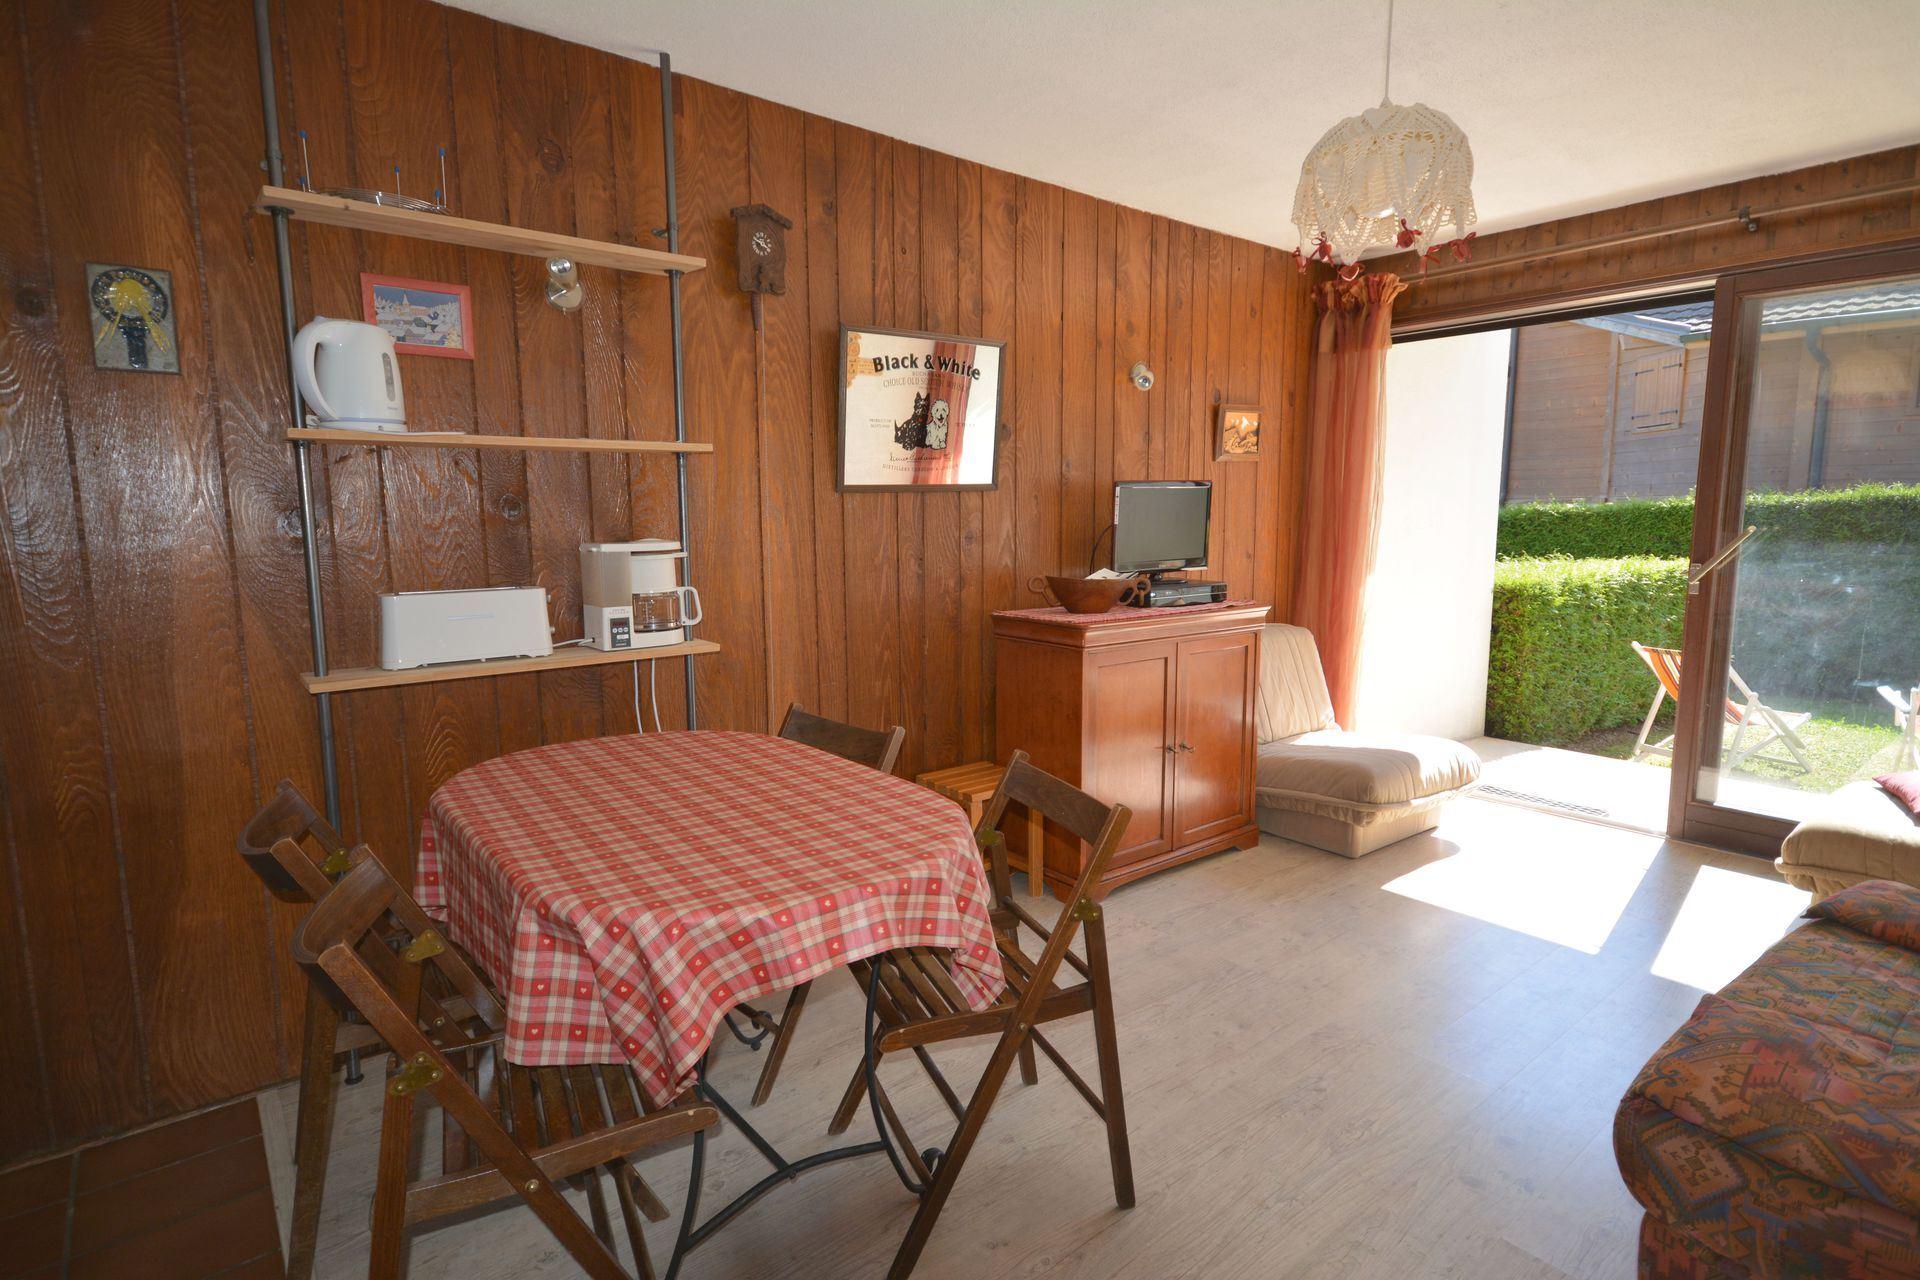 Benevy - AO 2004 - 1 pièce + cabine - 4 personnes - 30m²